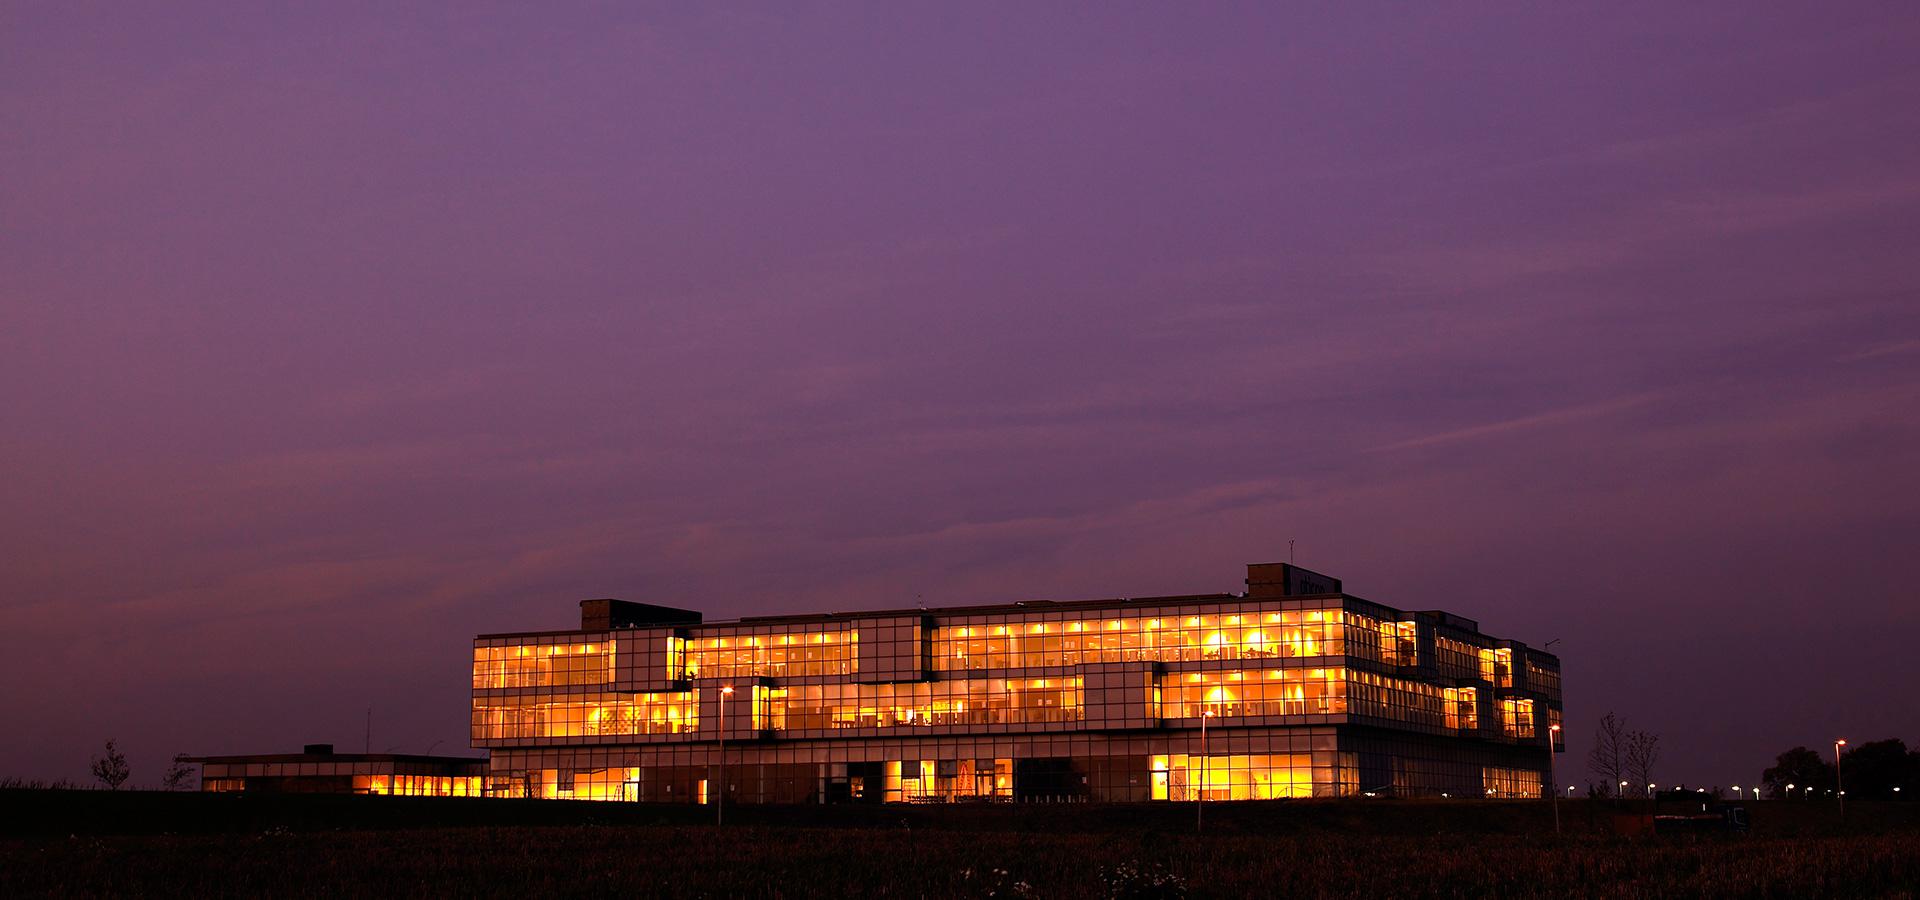 Oticon Denmark global headquarters building at night